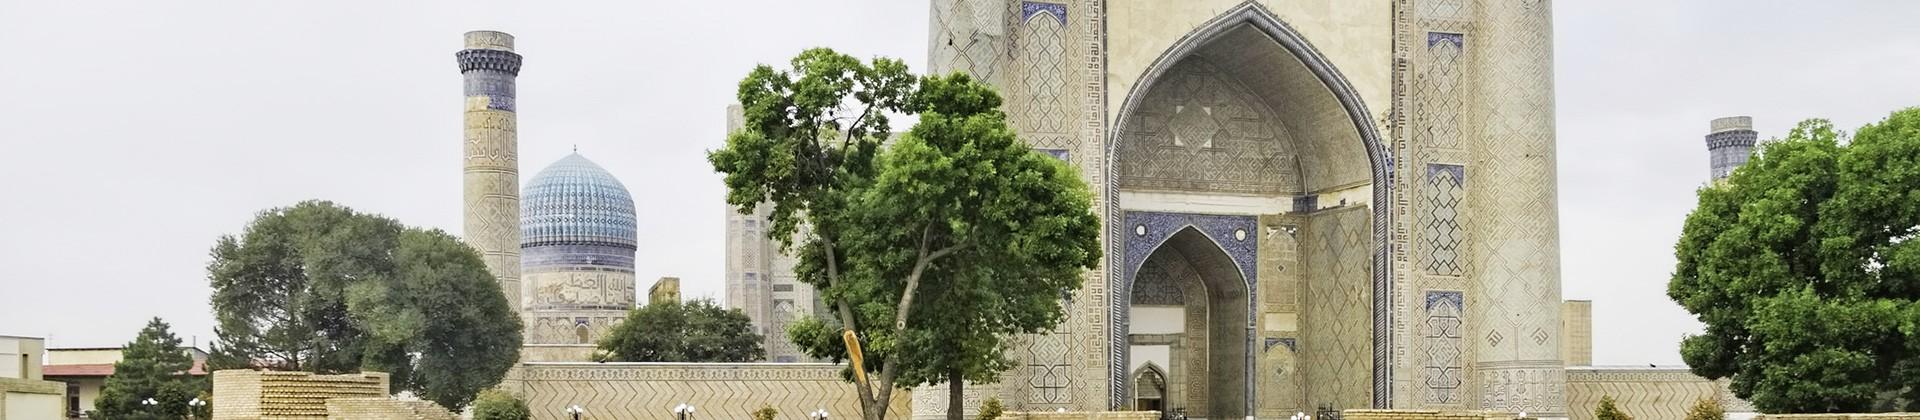 Bibi Khanym Mausoleum - 1